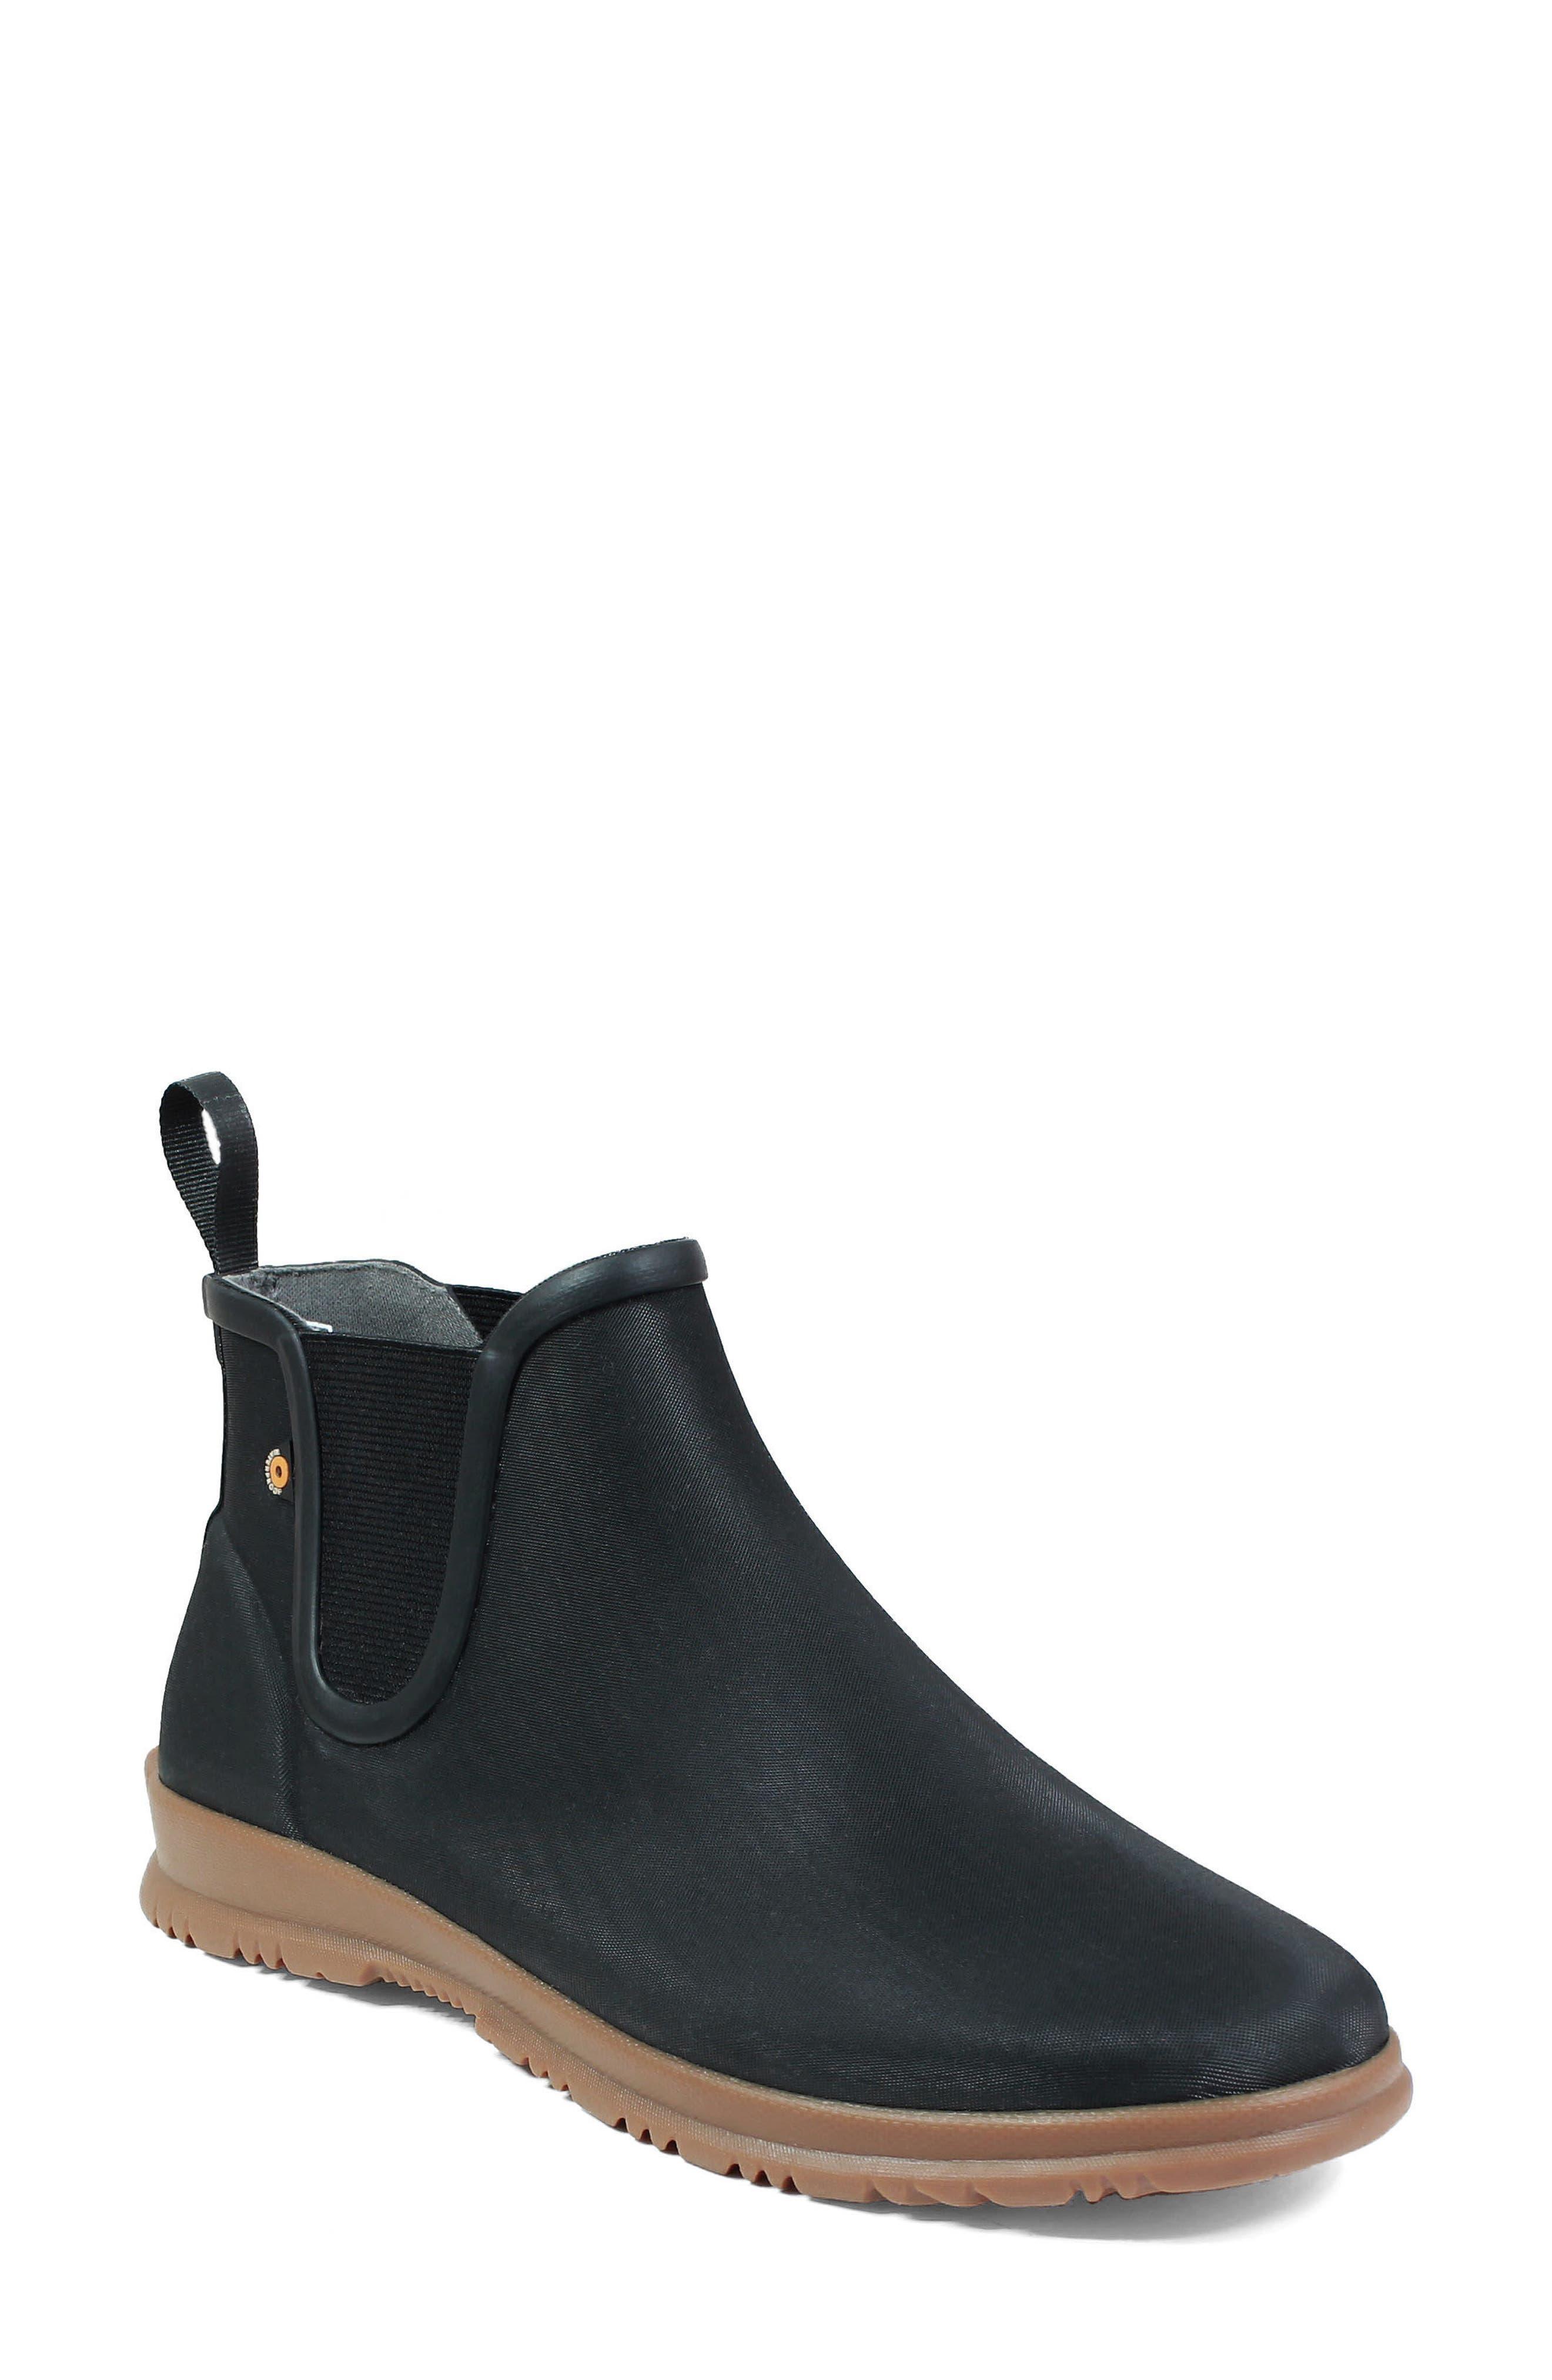 Bogs Sweetpea Rain Boot, Black